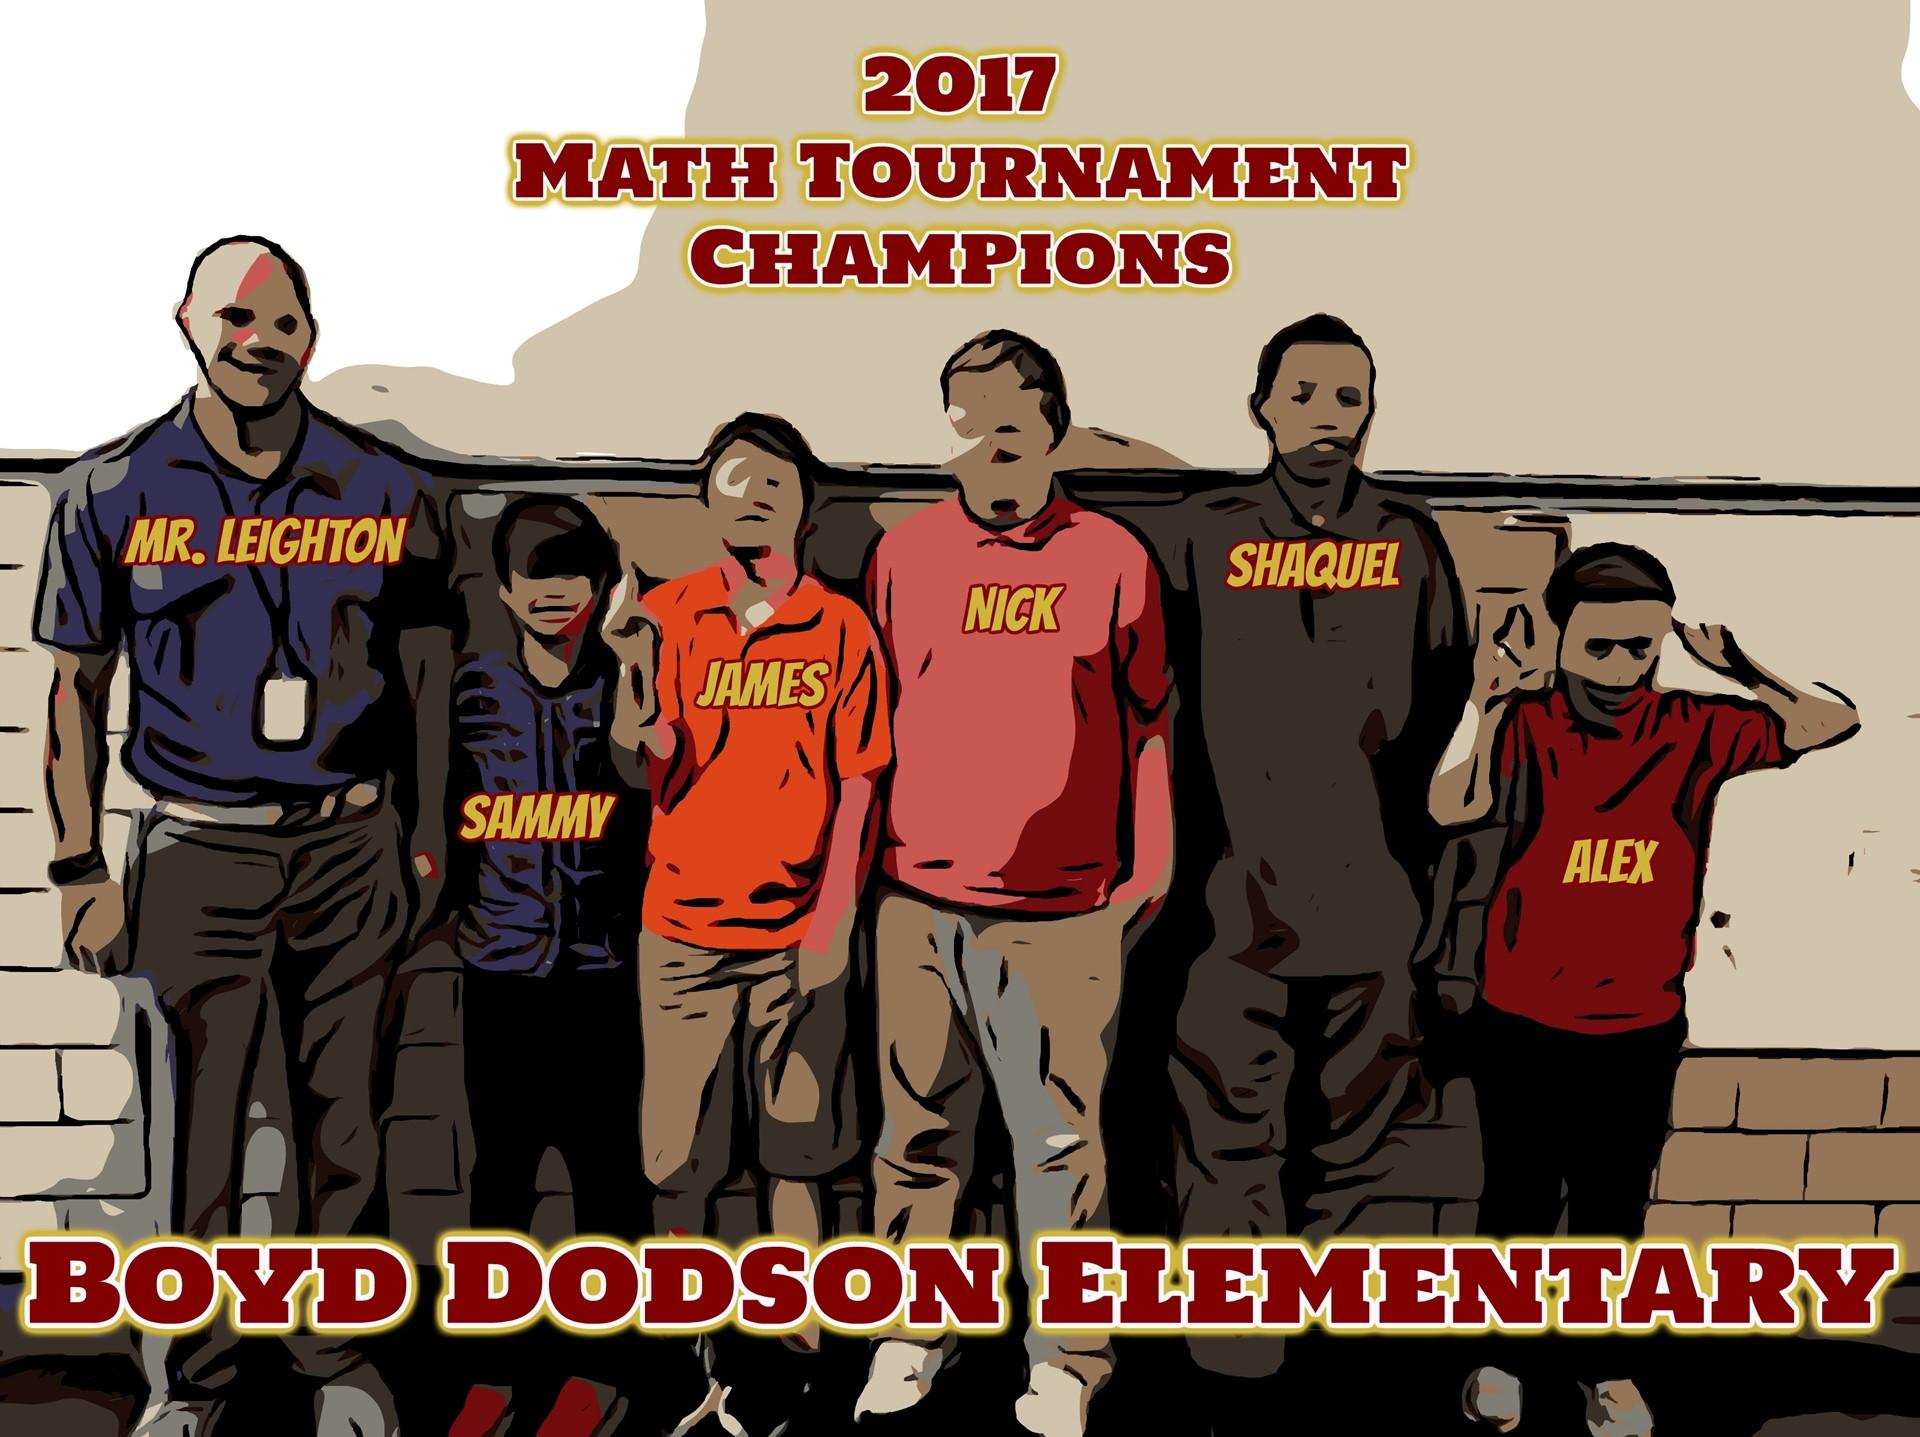 2017 Math Tournament Champions